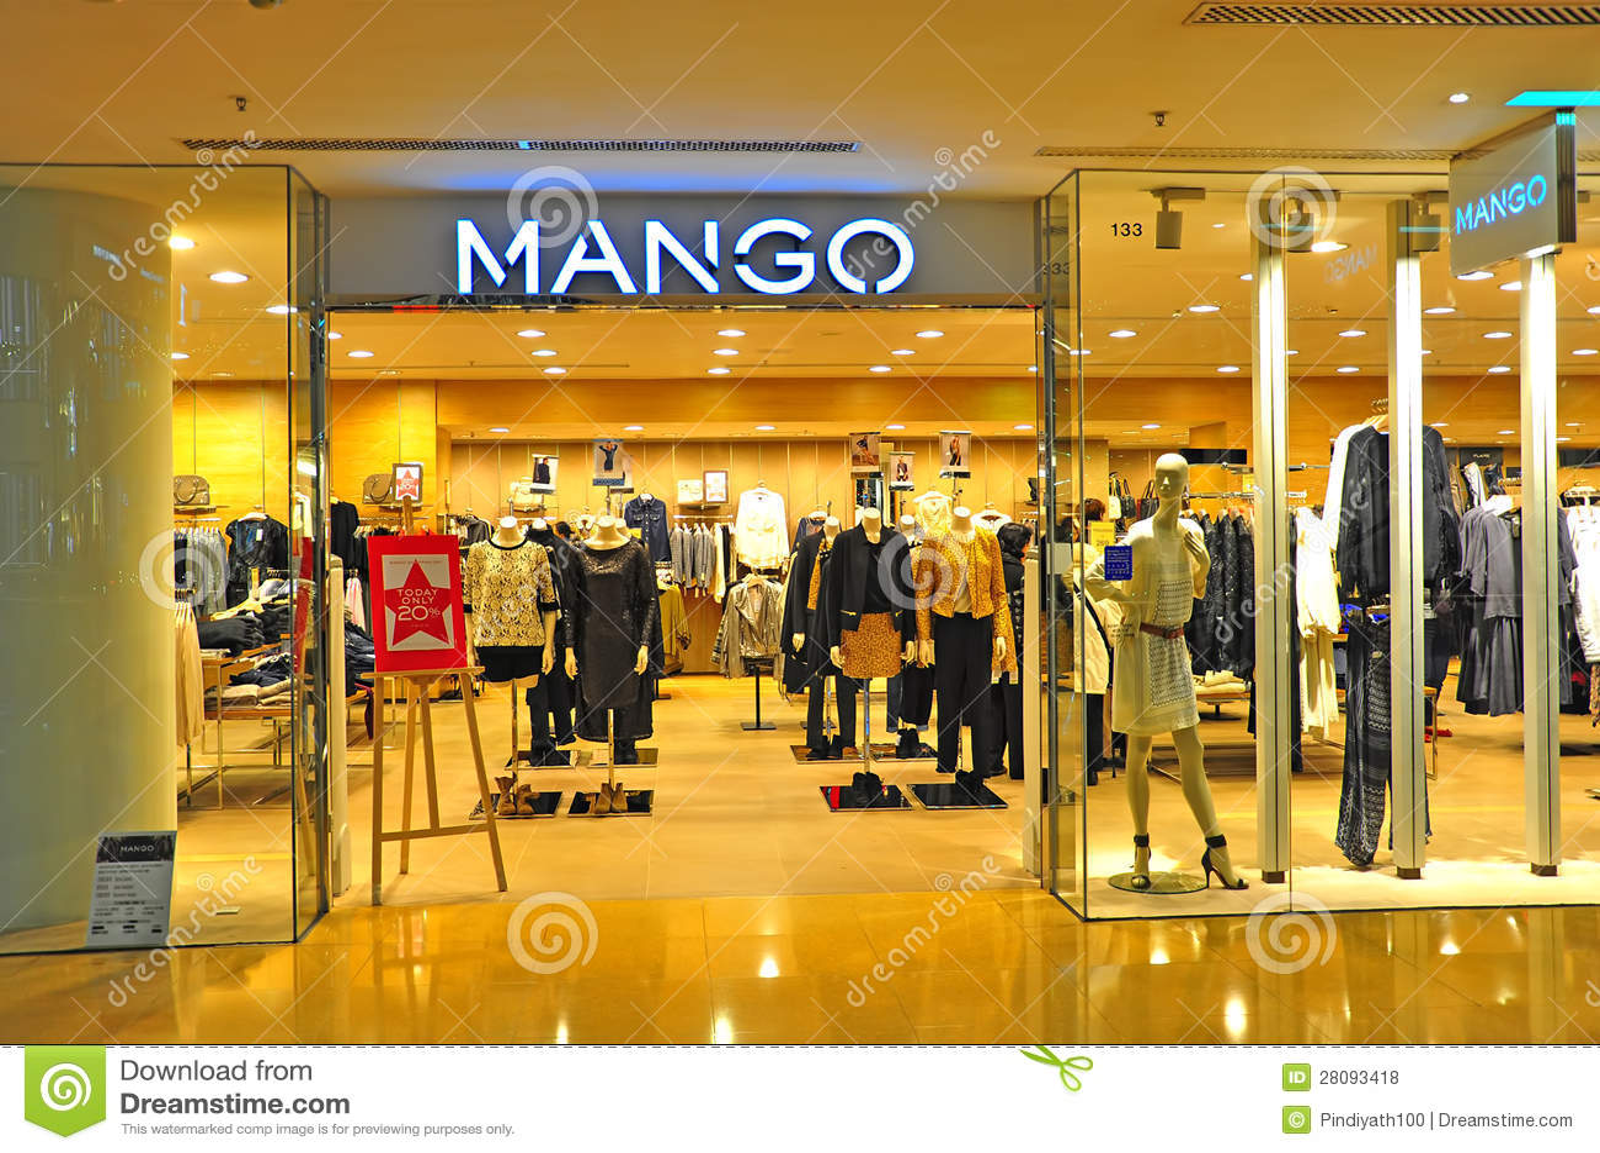 magasin d 39 habits de mangue hong kong photo stock ditorial image du showroom vente 28093418. Black Bedroom Furniture Sets. Home Design Ideas